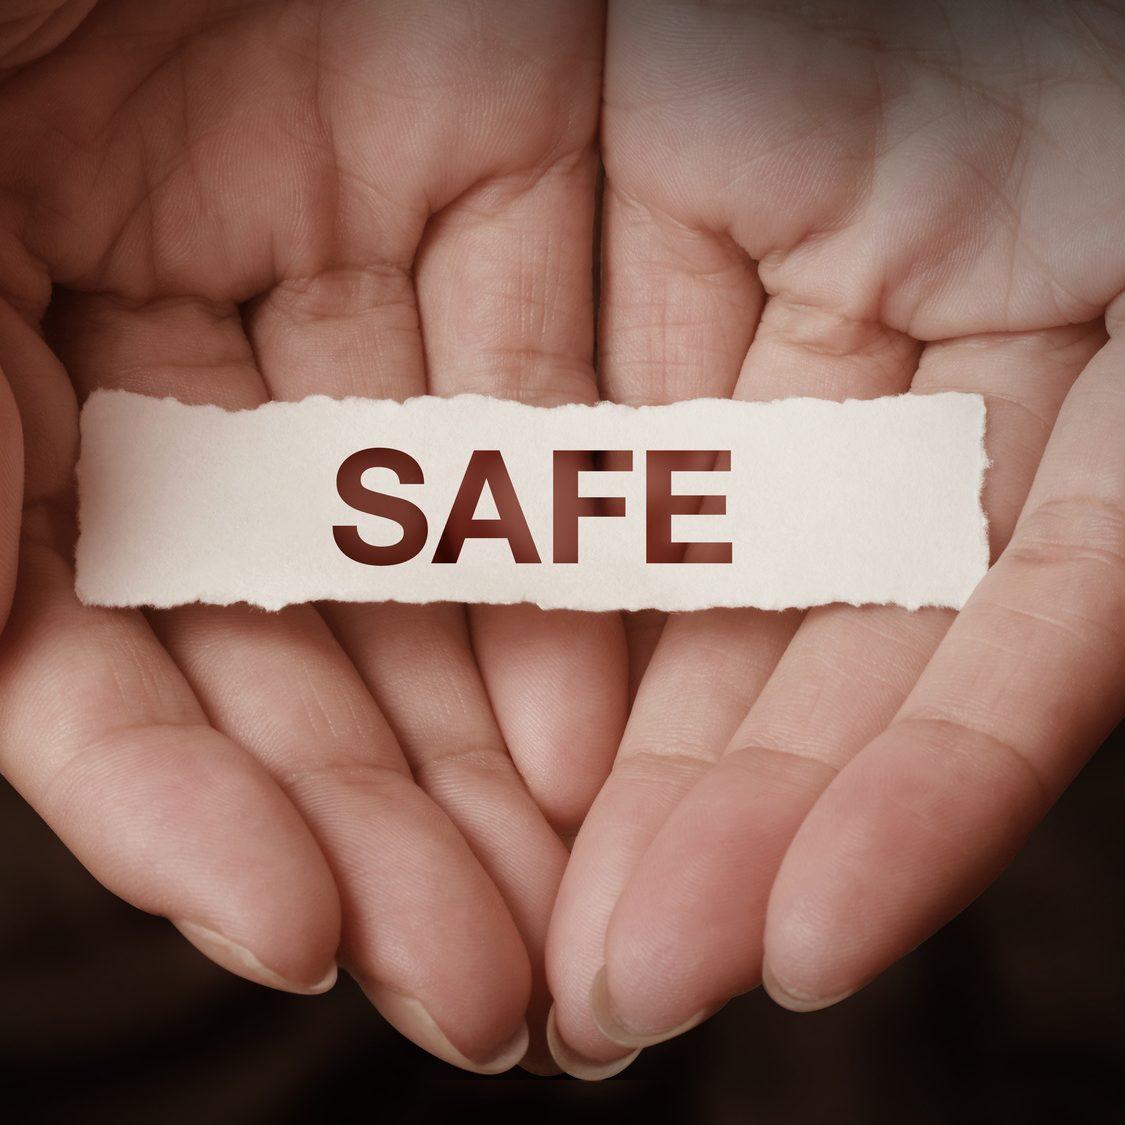 Safe text on hand design concept